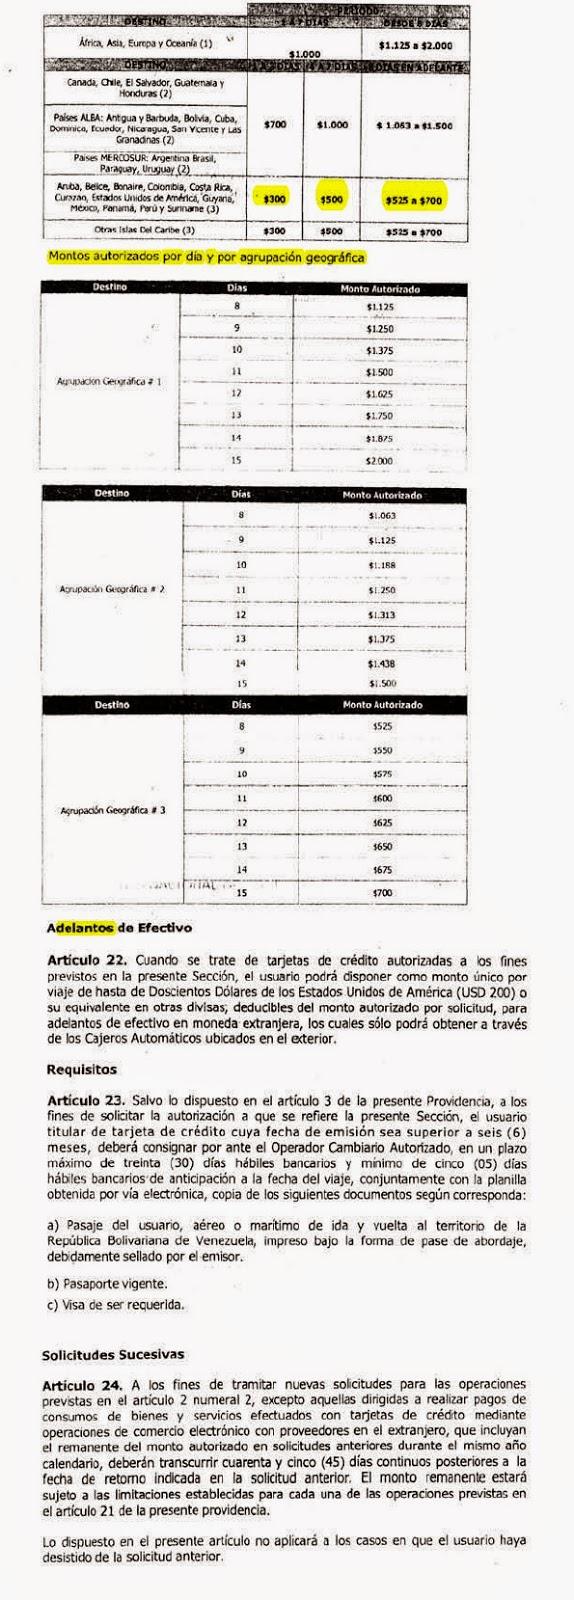 Loteria de Visas (Greencard Diversity Lottery) , Visas B1-B2-F1 ...